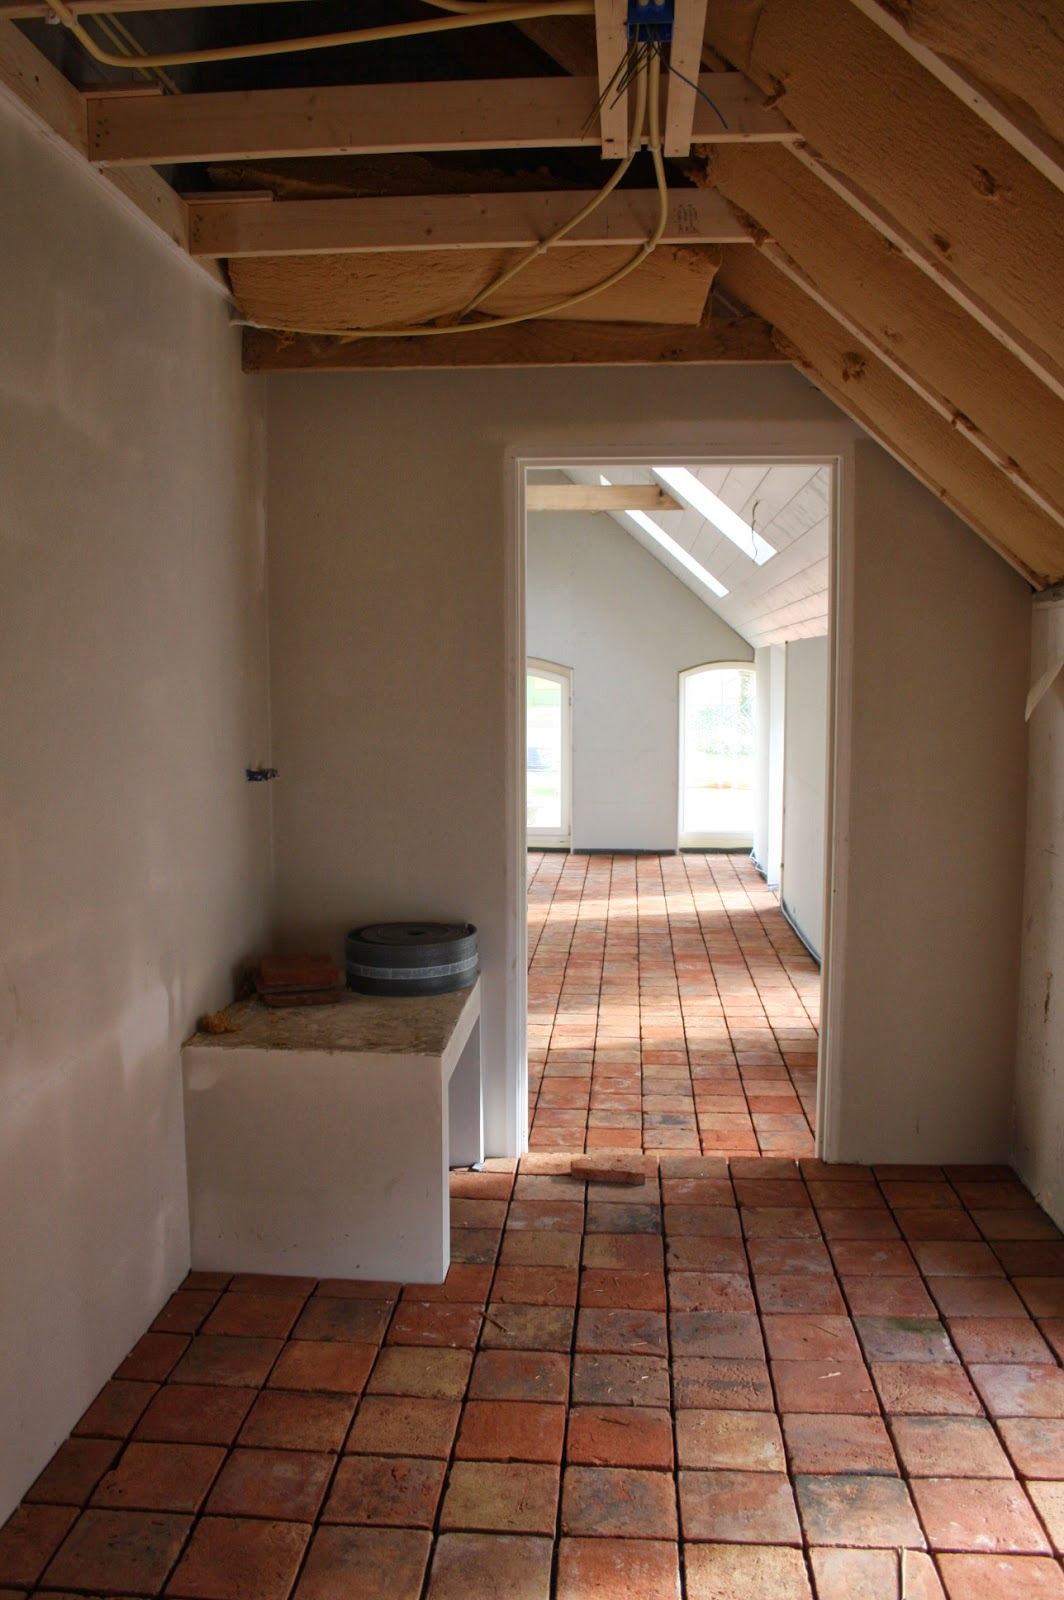 Erve borkens eerste verdieping - Keuken berghuisje ...